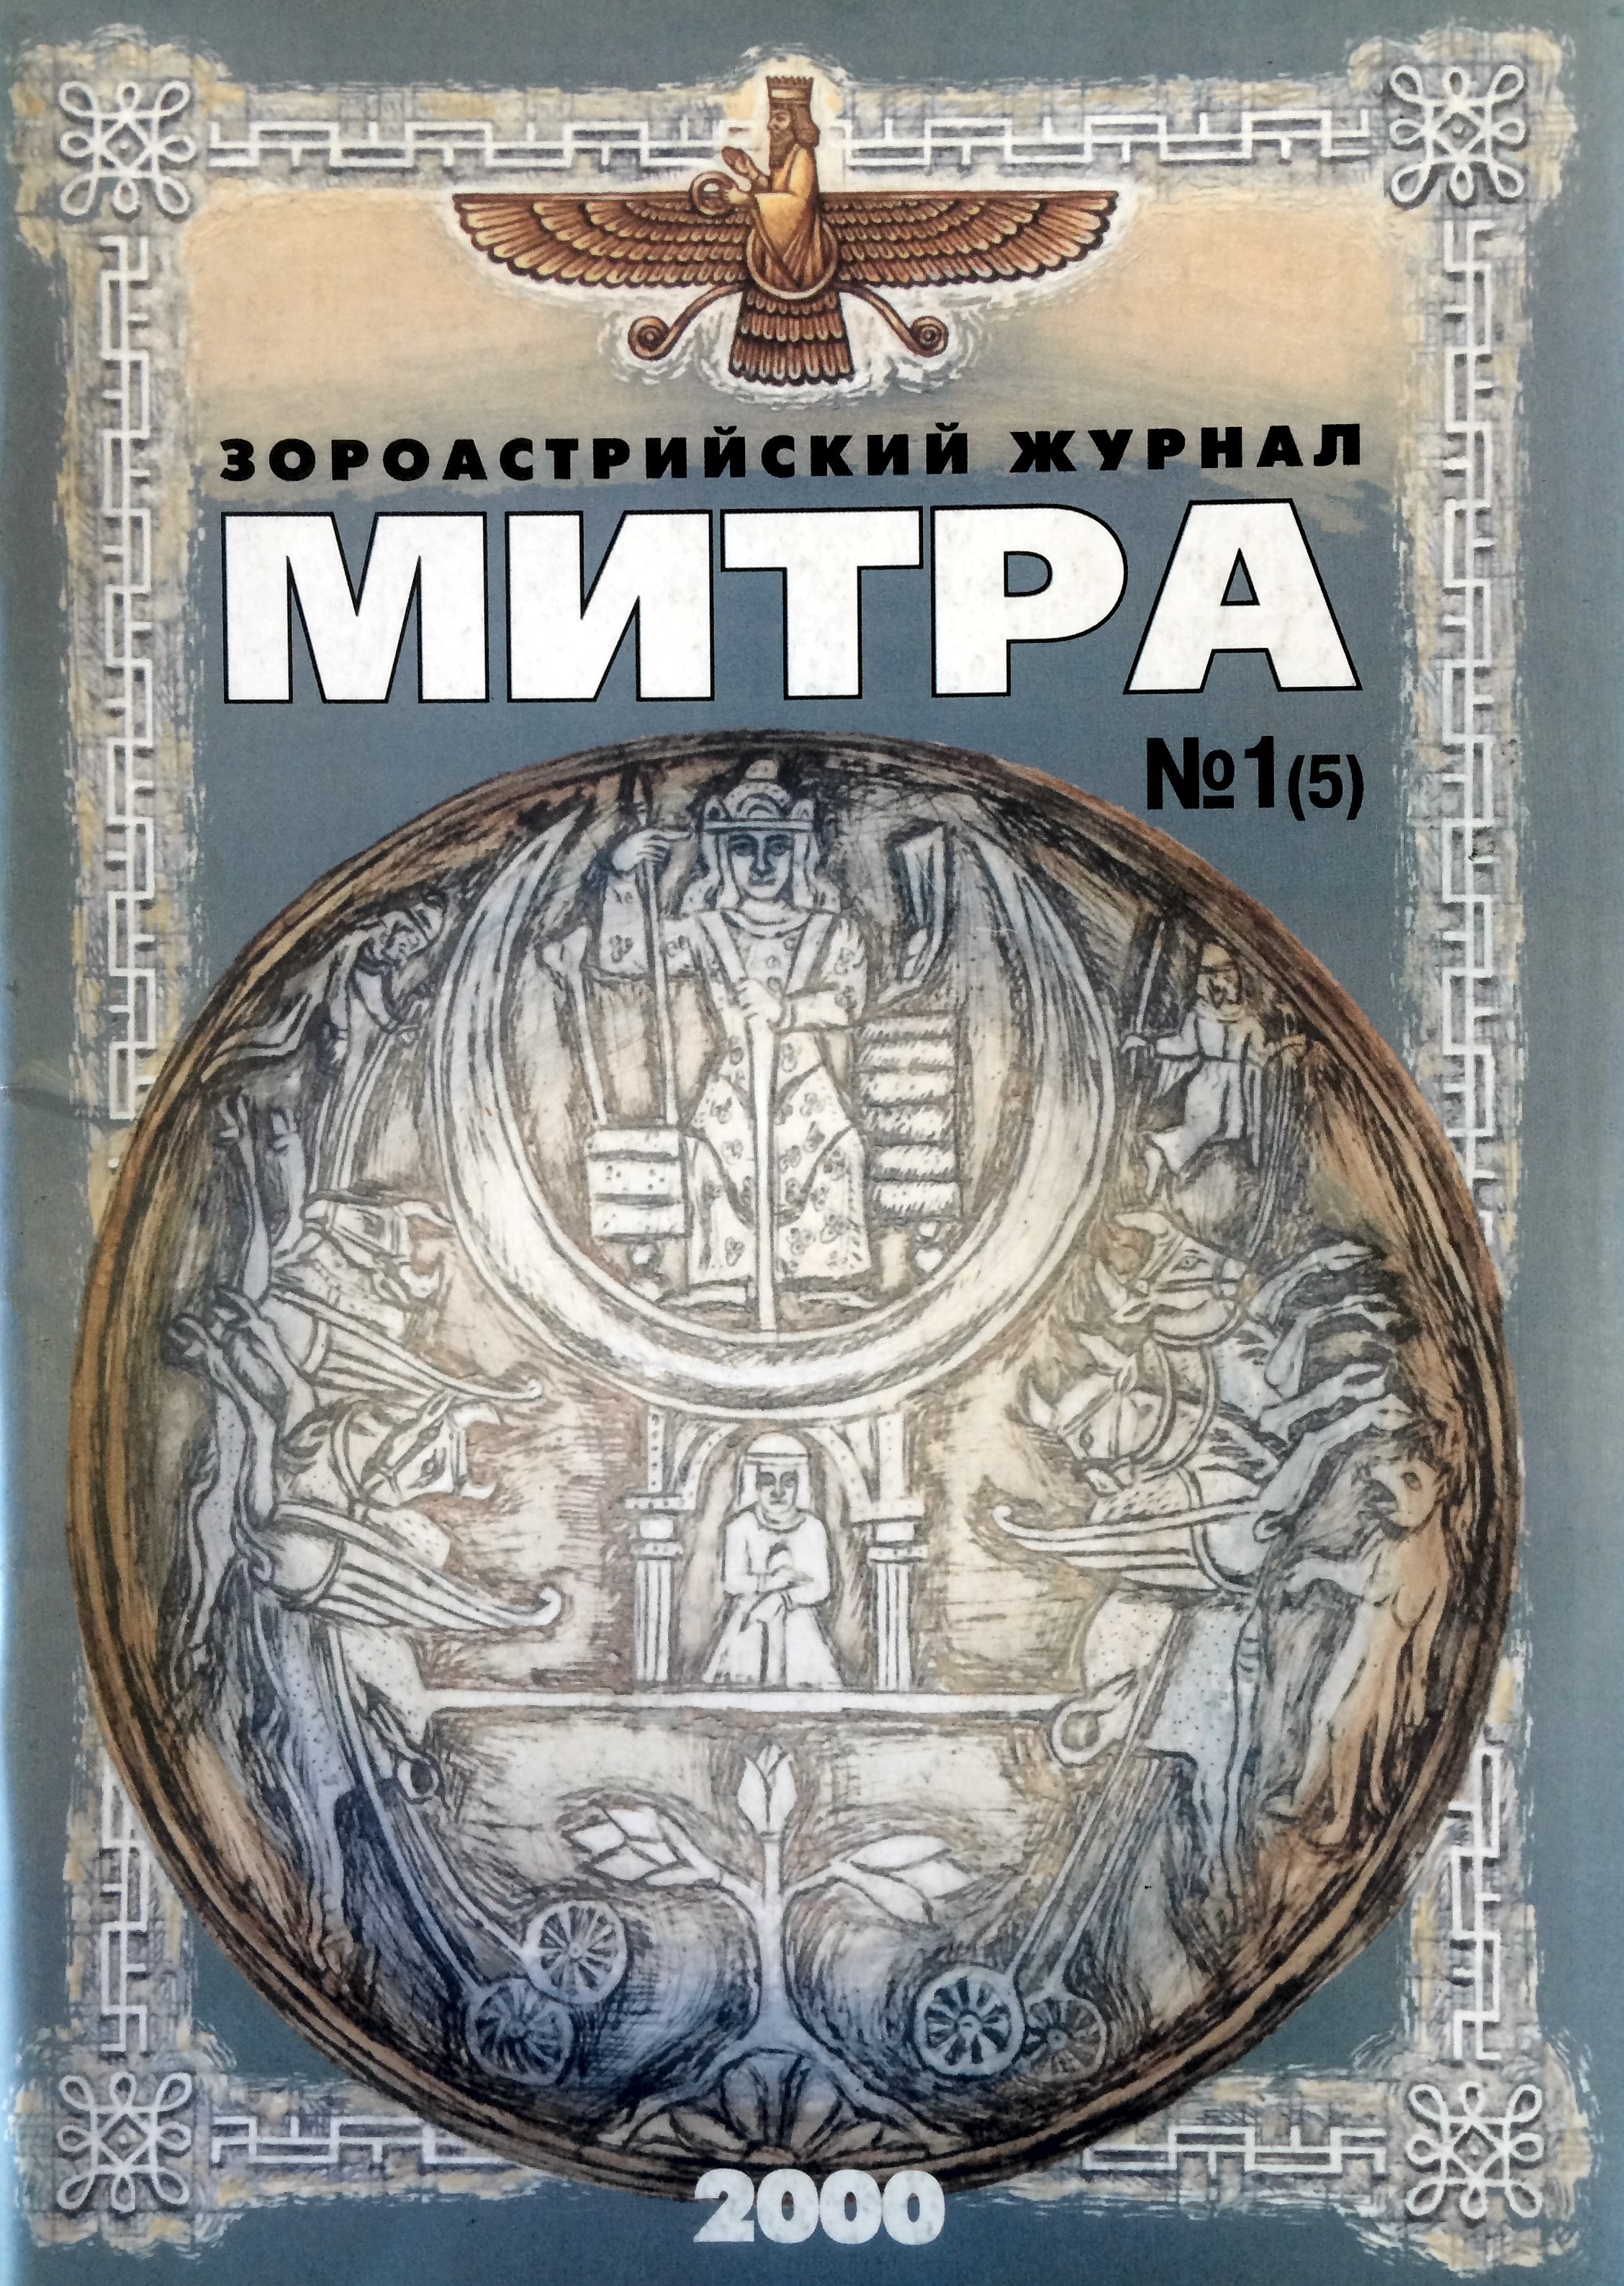 Mitra-01-05-2000